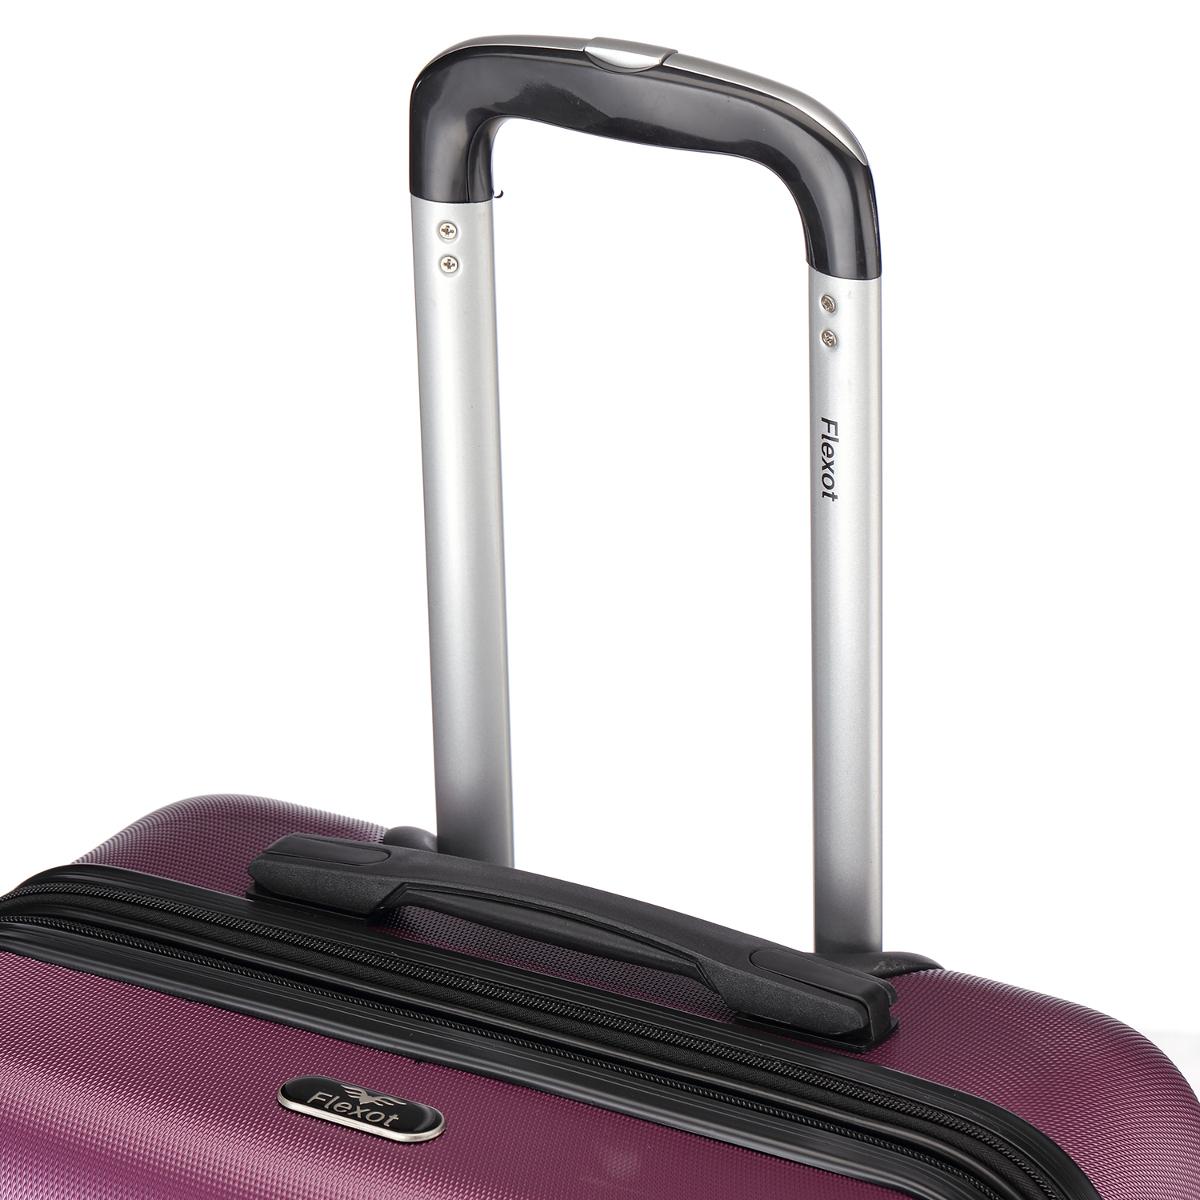 Koffer-Flexot-2045-Hartschalenkoffer-Trolley-Kofferset-Reisekoffer-M-L-XL-Set Indexbild 86